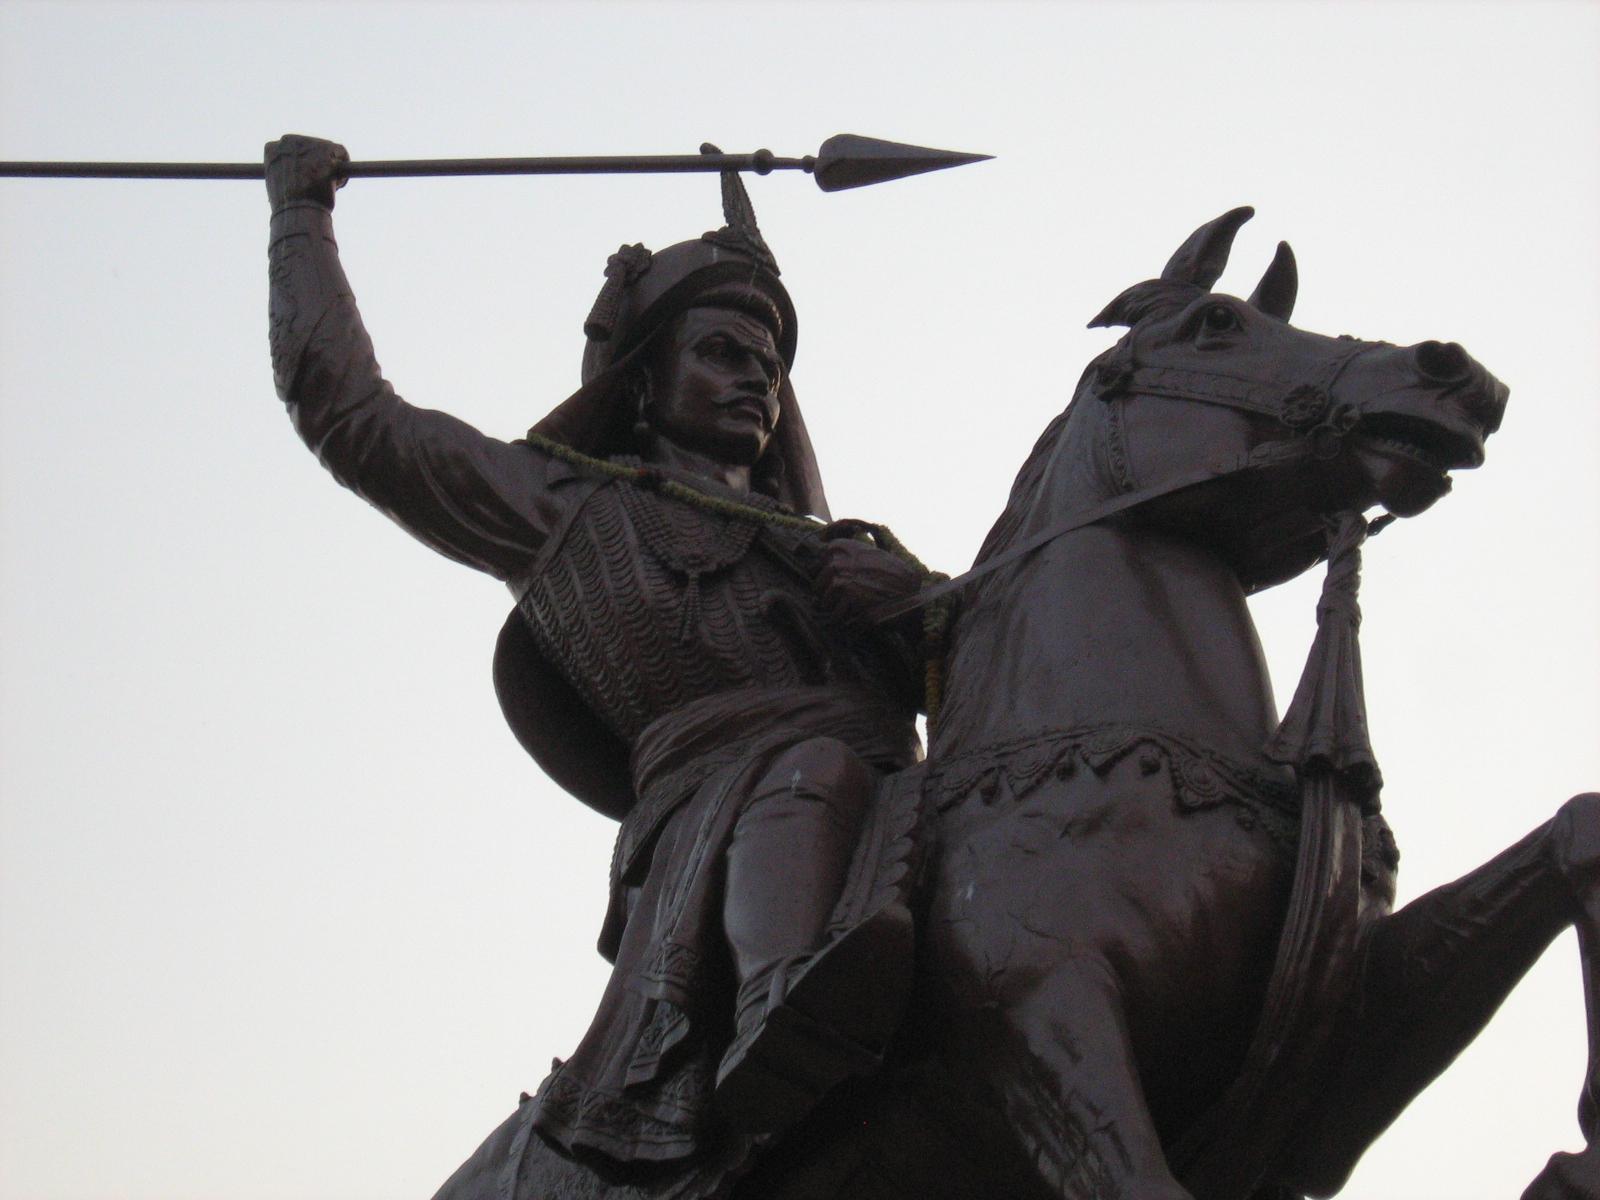 File:Bajirao Peshwa.jpg.